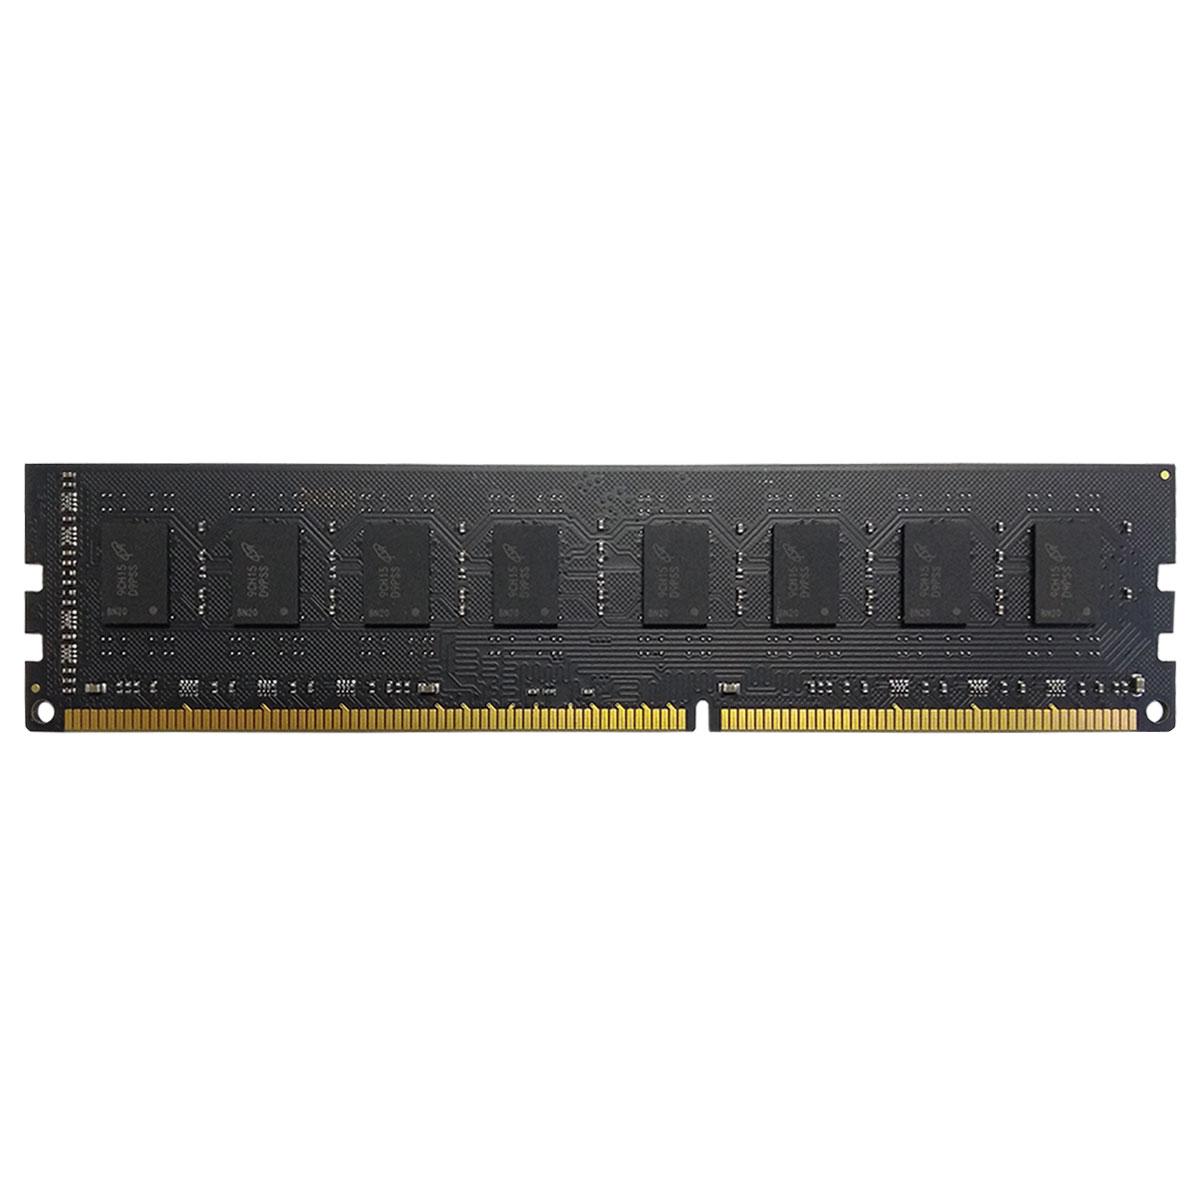 Memória KTROK KTROK4G1333 4GB, DDR3, 1333MHz, CL9